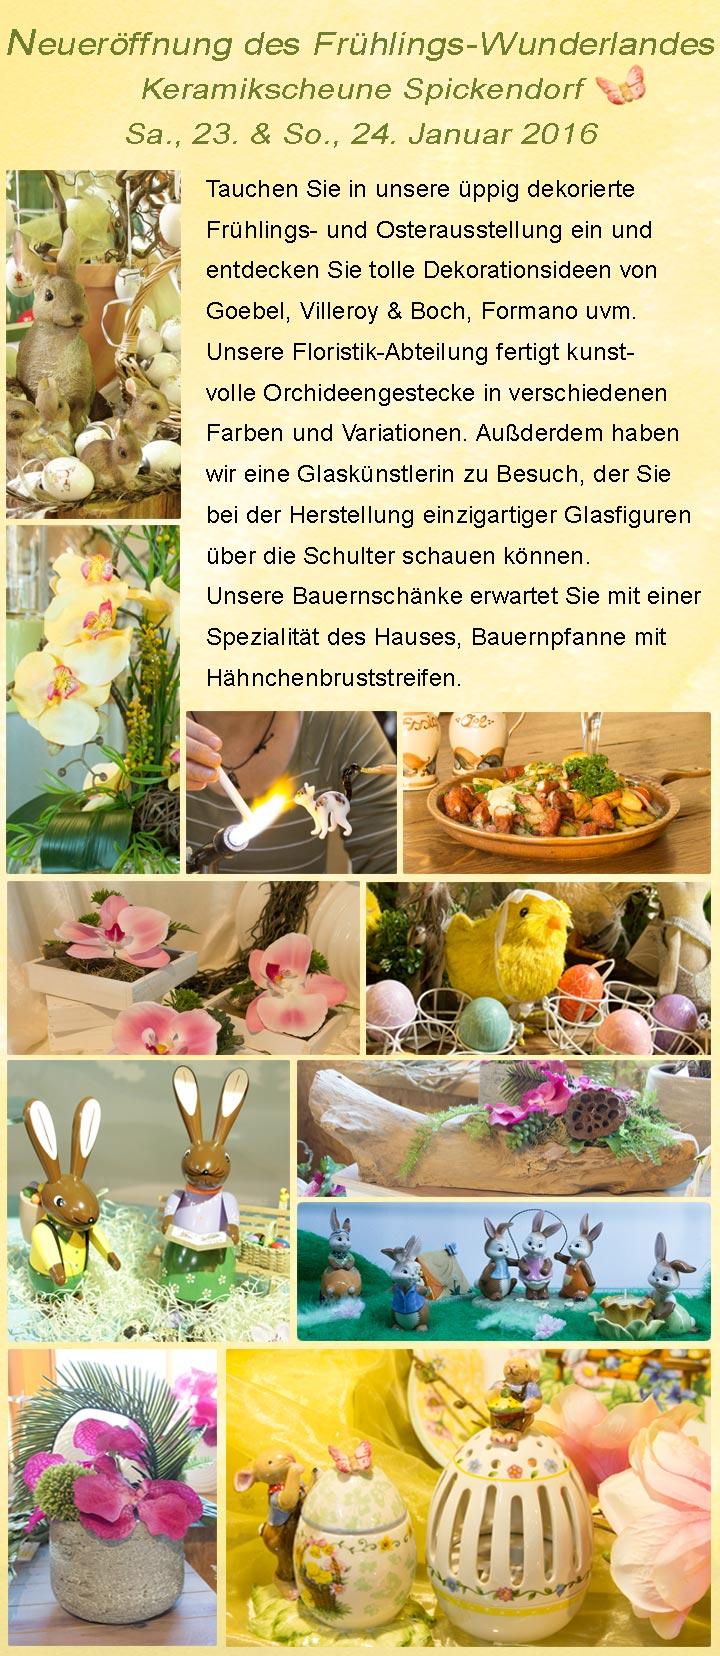 Newsletter-01.2016-Frühlings--und-Osterausstellung